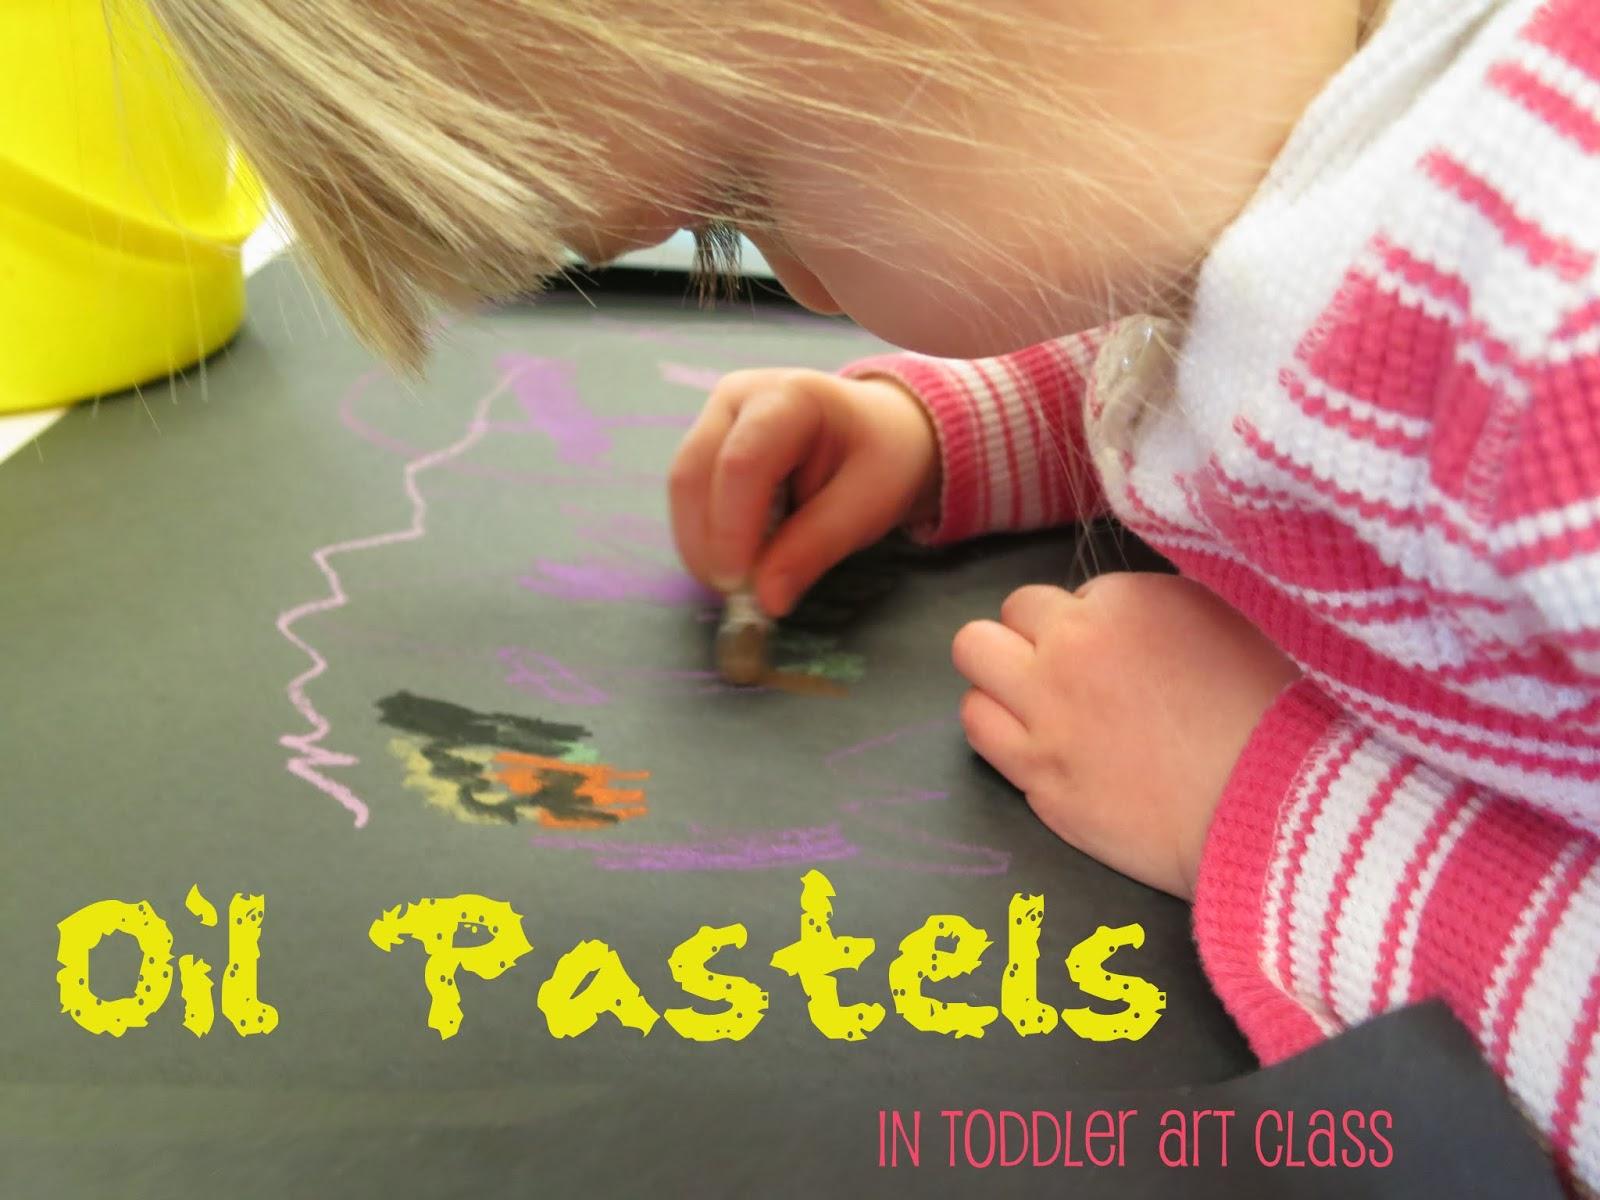 http://librarymakers.blogspot.com/2014/02/toddler-art-class-oil-pastels.html